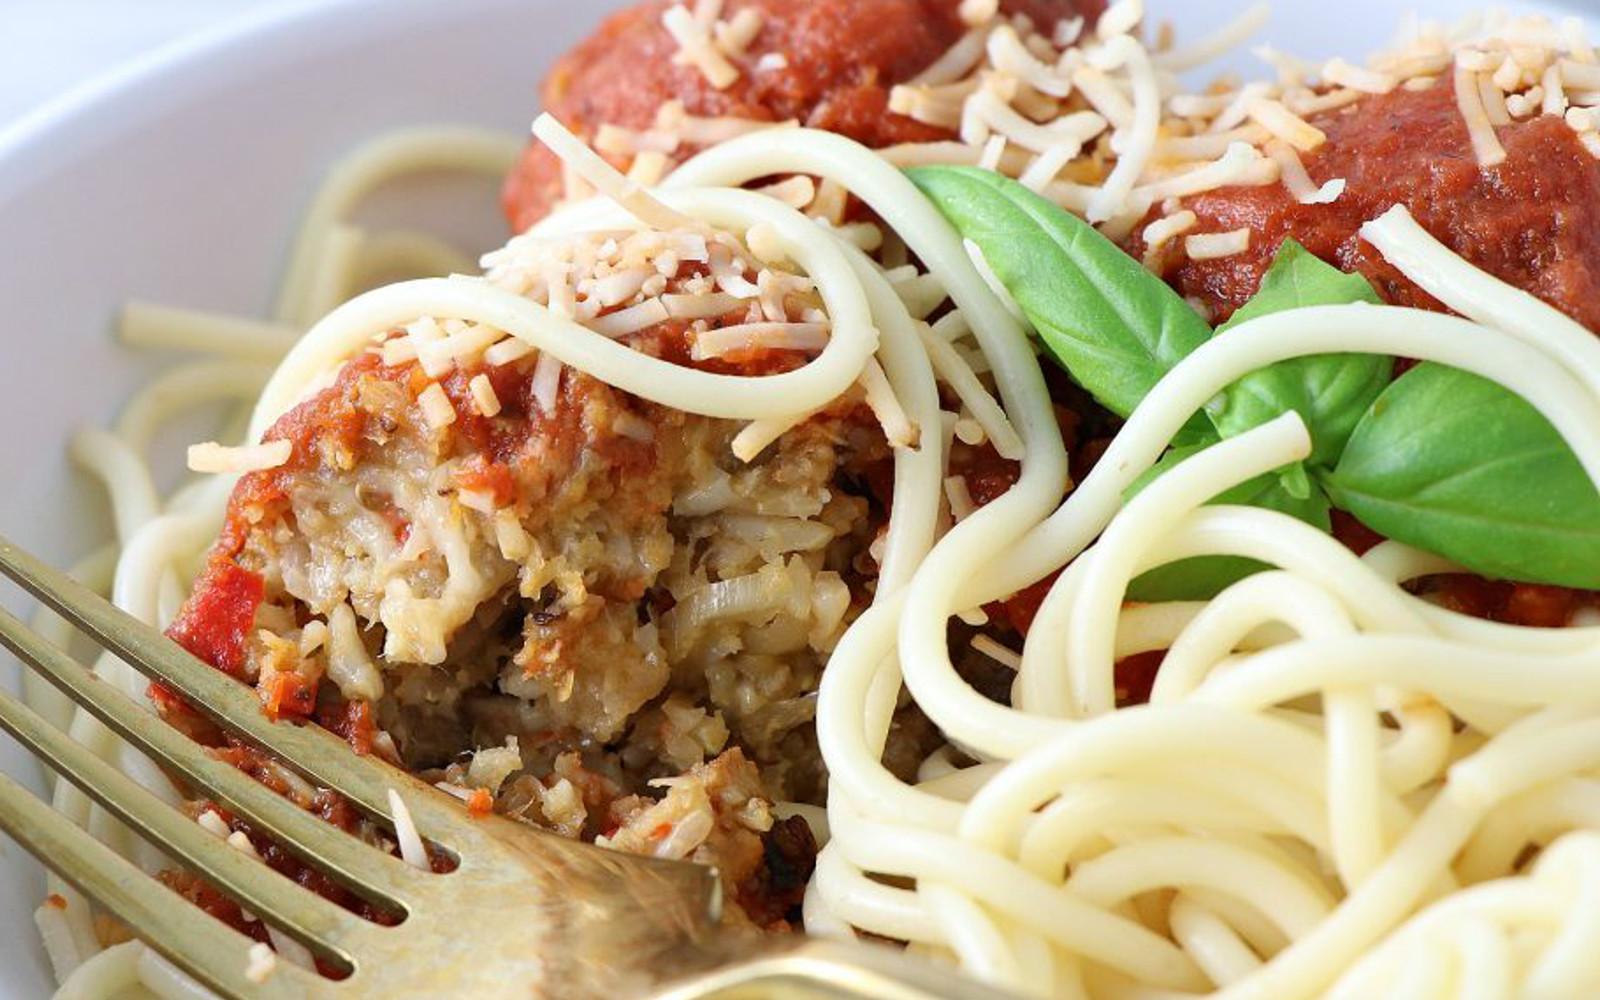 Vegan Eggplant Cauliflower Meatballs over pasta with sauce and vegan cheese cut open